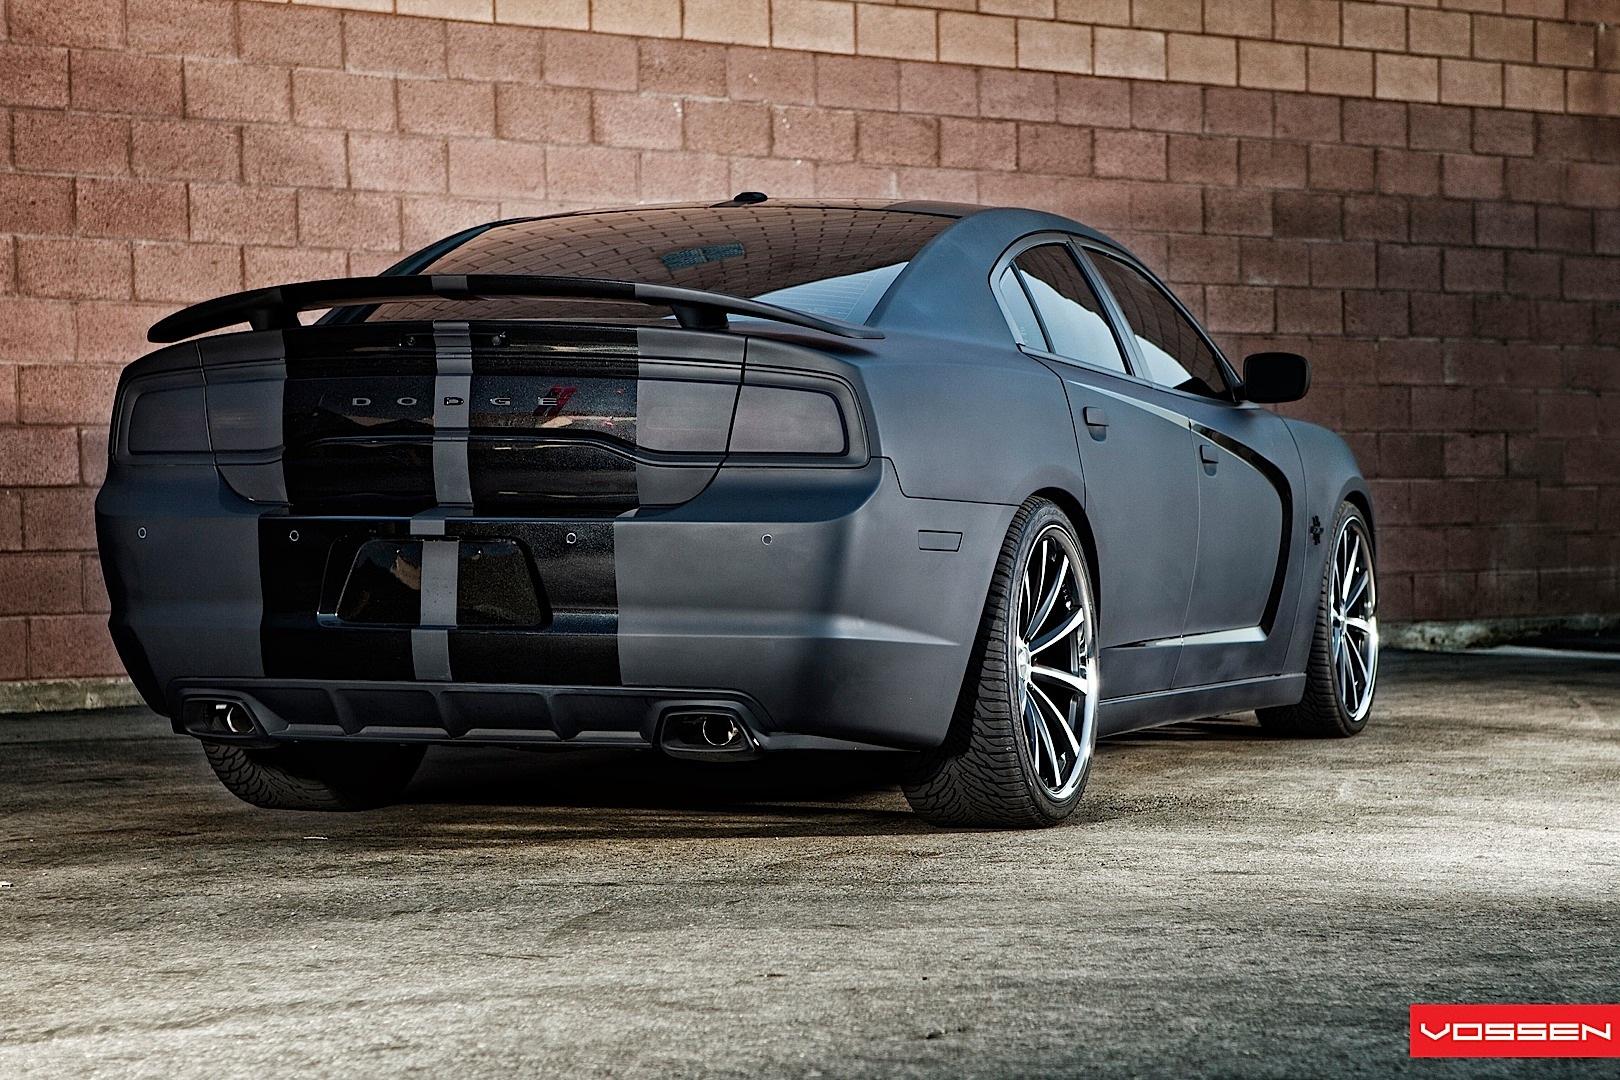 dodge charger gets matte black wrap and vossen wheels autoevolution - 2013 Dodge Charger Black Rims